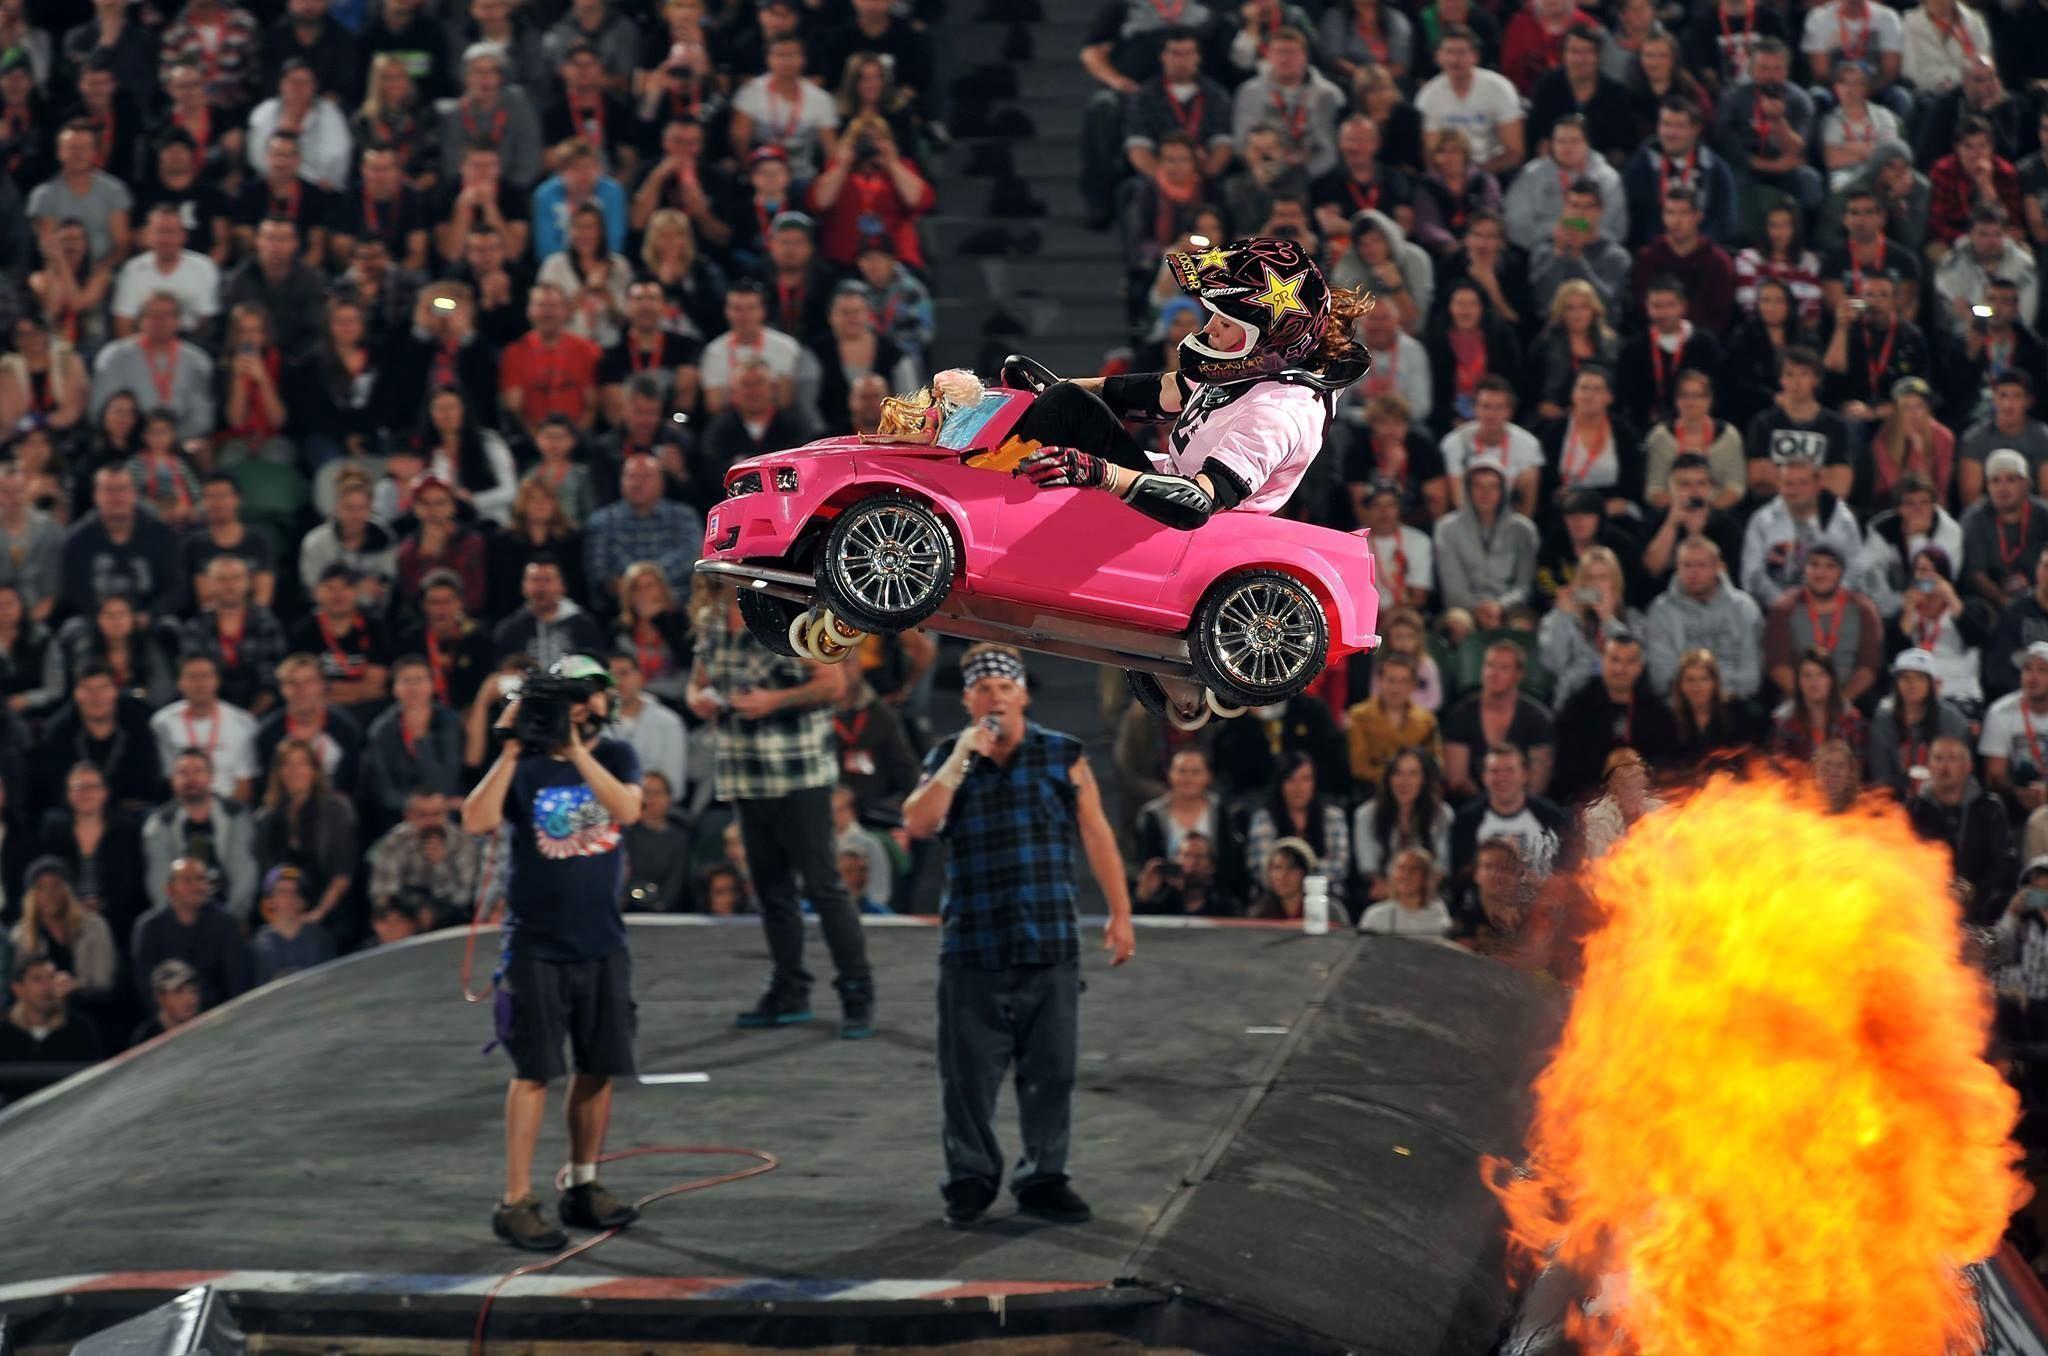 The Barbie Car! - Nitro Circus #barbiecars The Barbie Car! - Nitro Circus #barbiecars The Barbie Car! - Nitro Circus #barbiecars The Barbie Car! - Nitro Circus #barbiecars The Barbie Car! - Nitro Circus #barbiecars The Barbie Car! - Nitro Circus #barbiecars The Barbie Car! - Nitro Circus #barbiecars The Barbie Car! - Nitro Circus #barbiecars